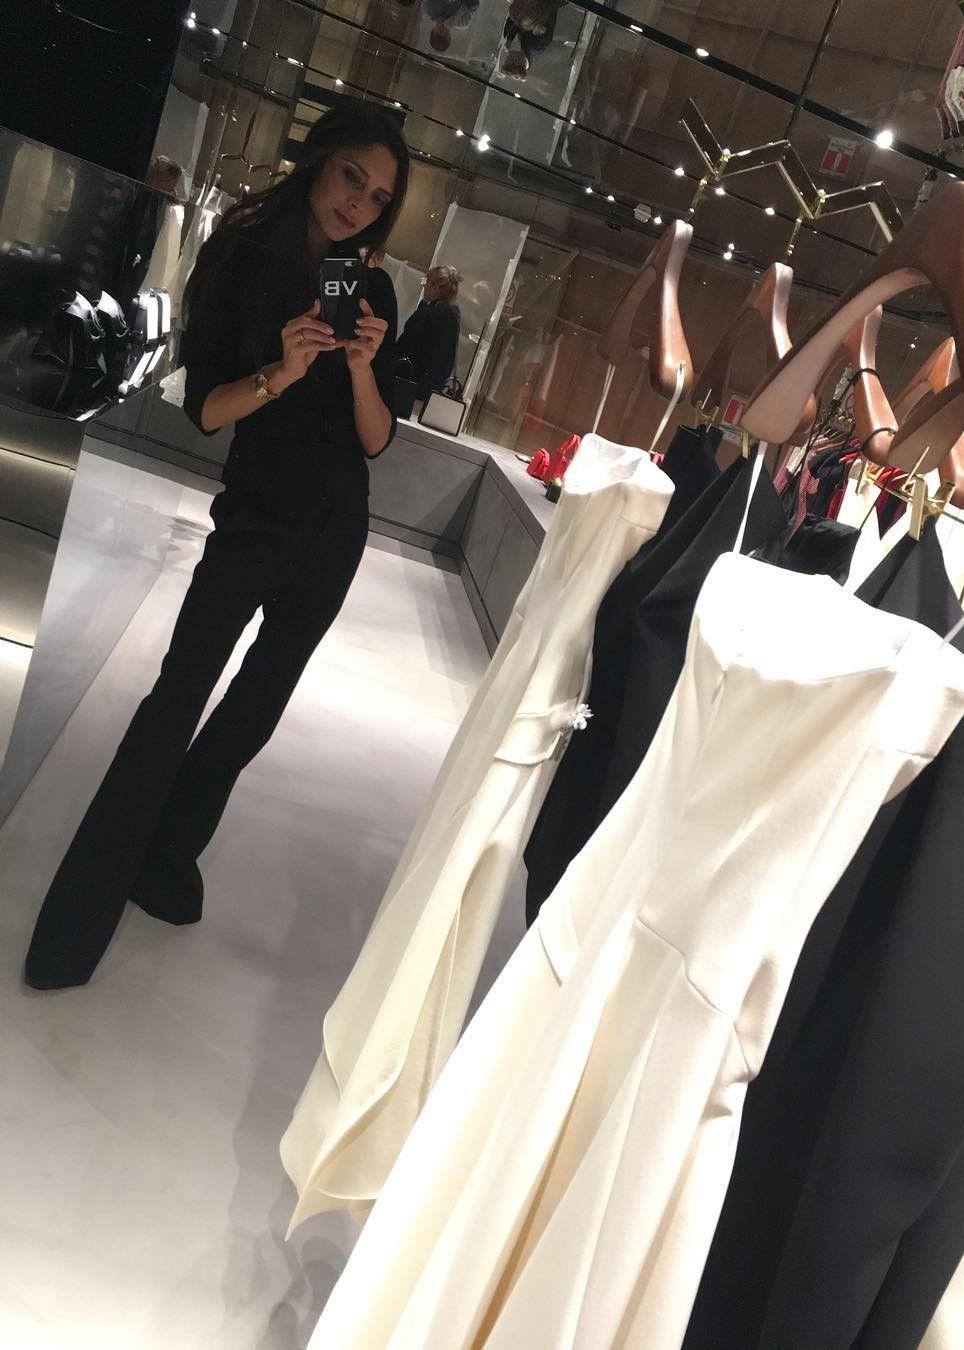 Suka Mirror Selfie? Tiru Gaya Modis Victoria Beckham Ini